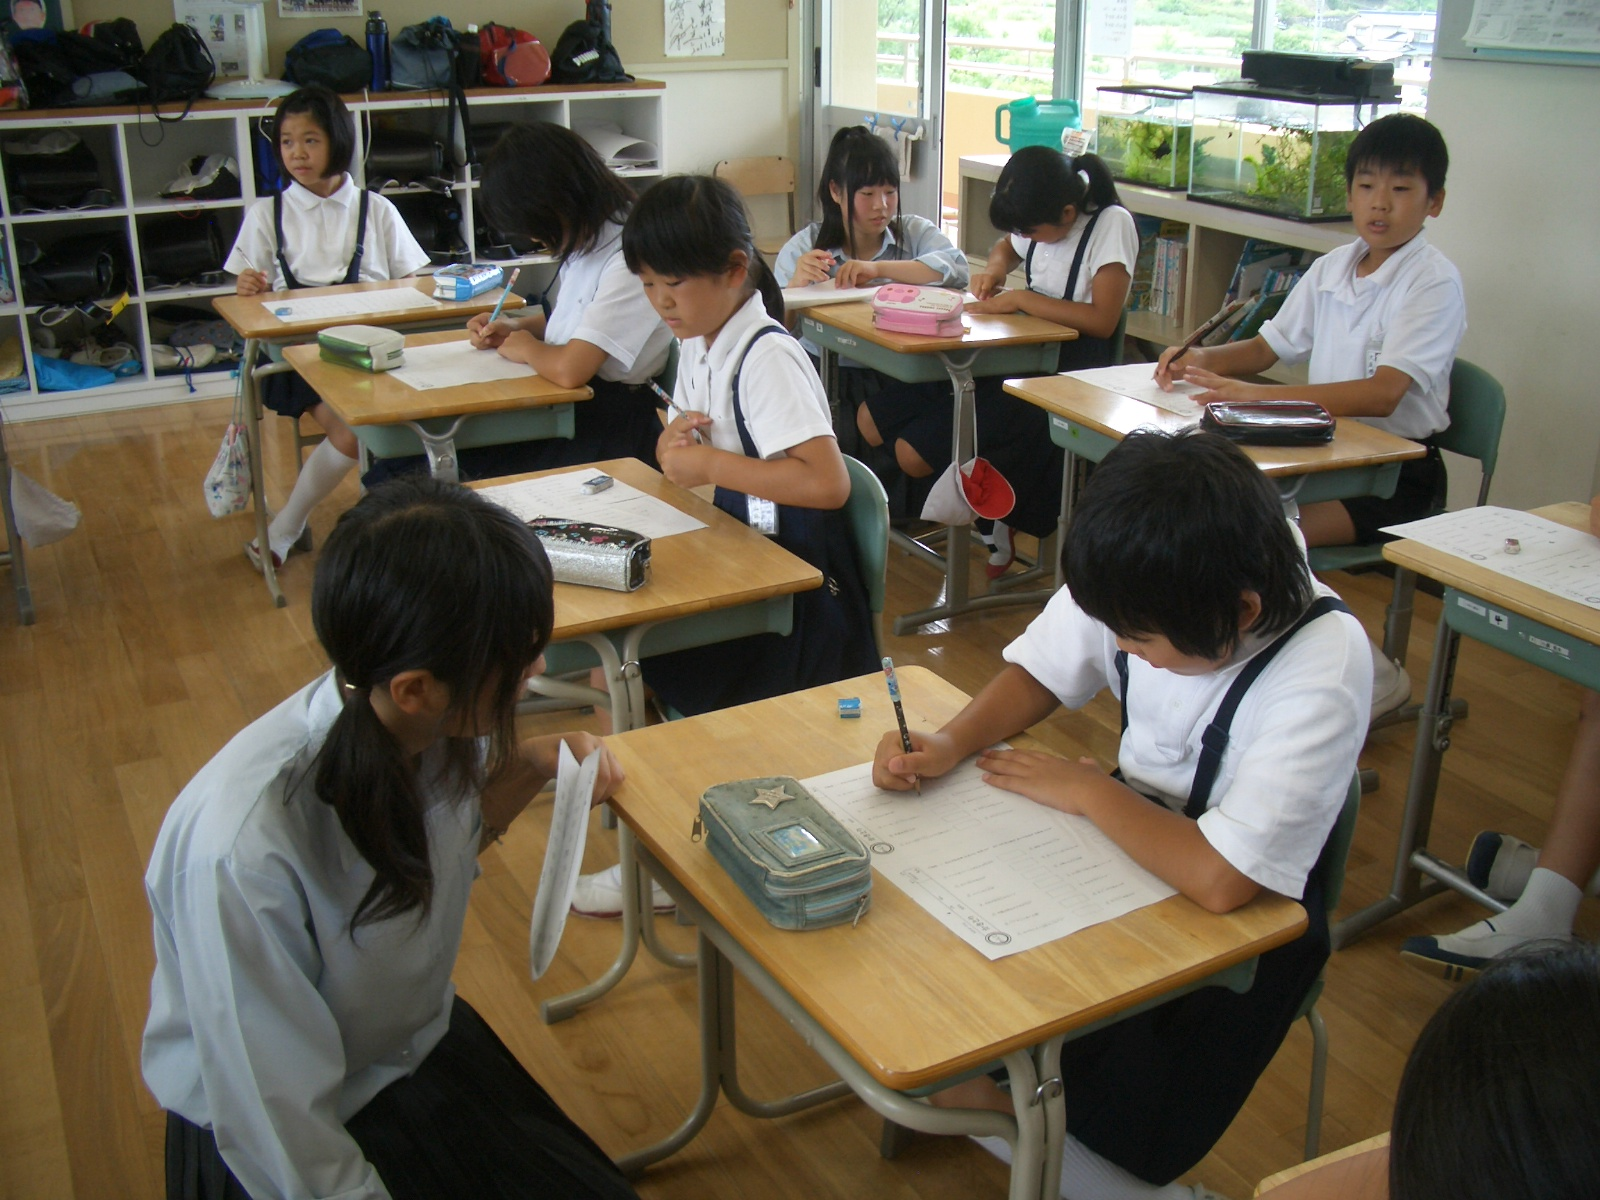 小田小学校ブログ: 7月チャレンジ教室 skip to main | ... 小田小学校ブログ